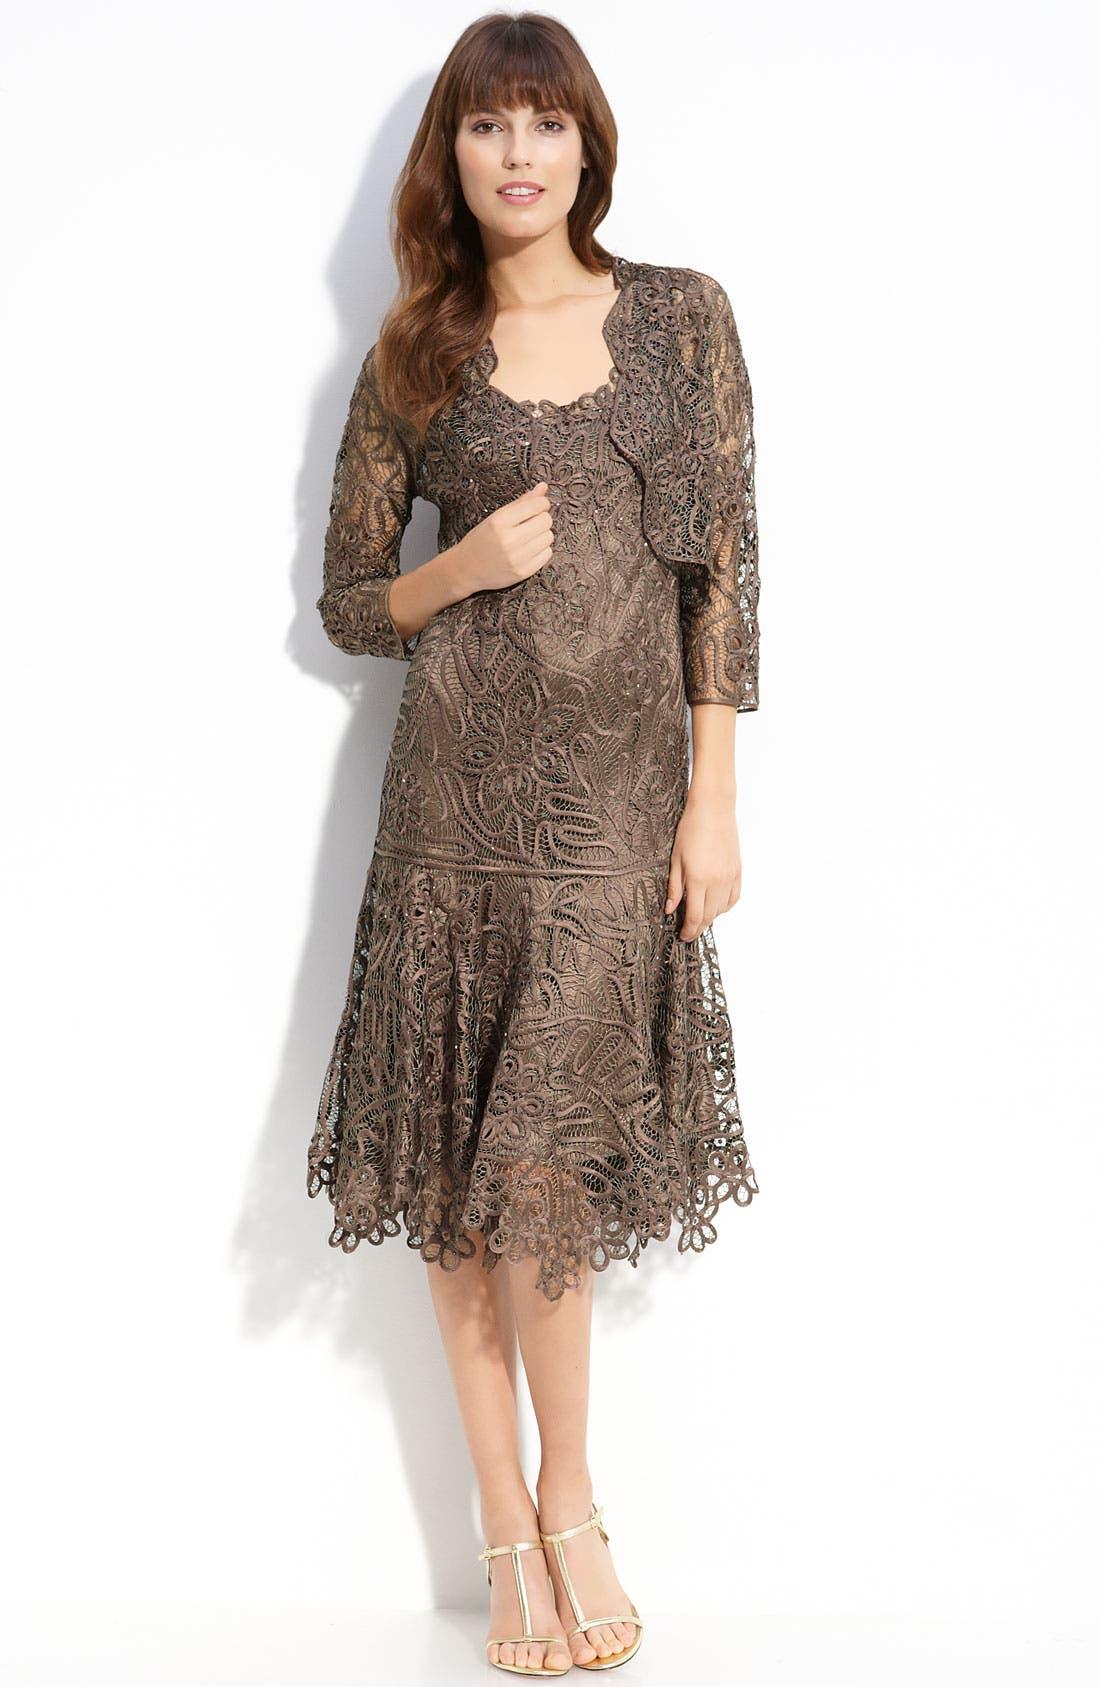 Alternate Image 1 Selected - Soulmates Beaded Crochet Silk Dress & Bolero